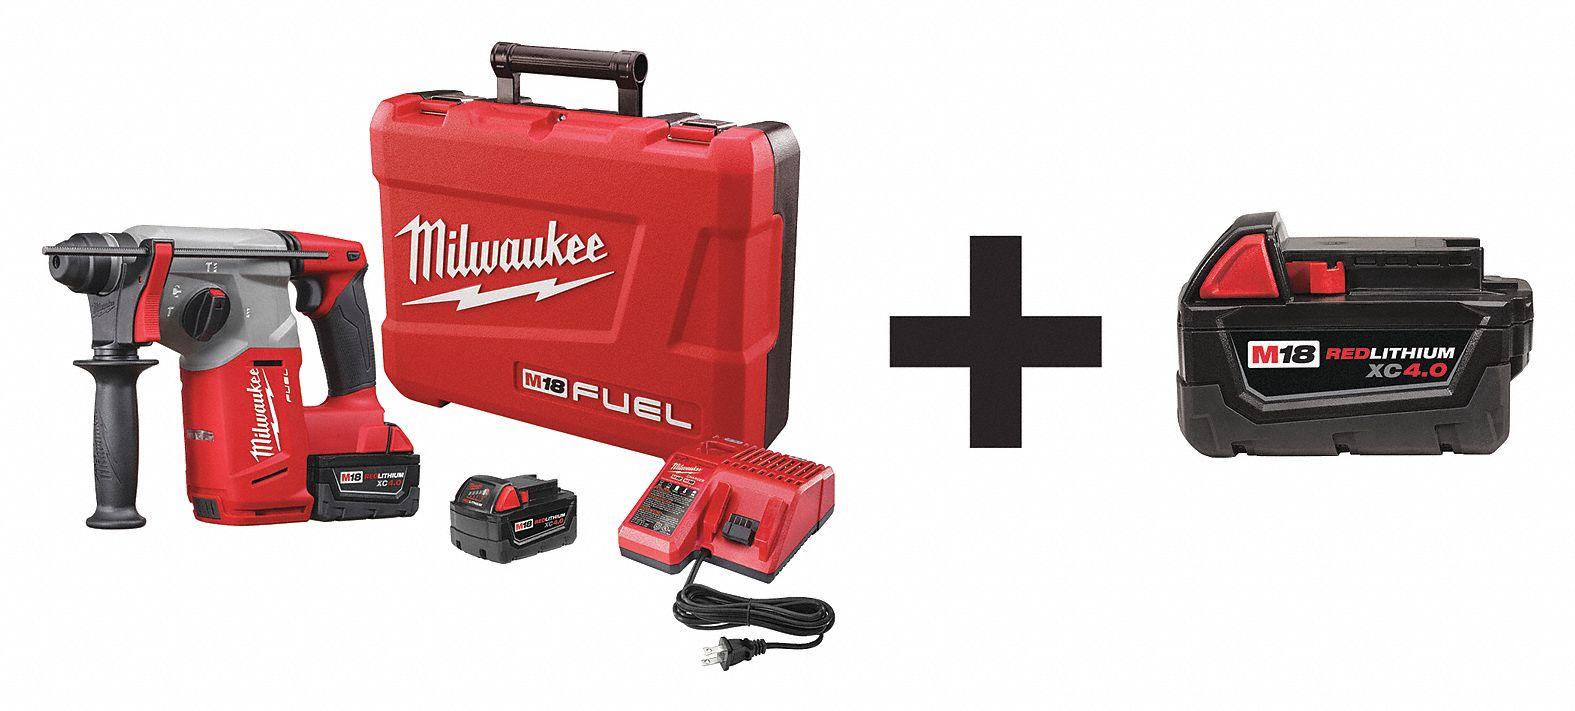 Milwaukee Cordless Rotary Hammer Kit 1 Tool 7dy02 2712